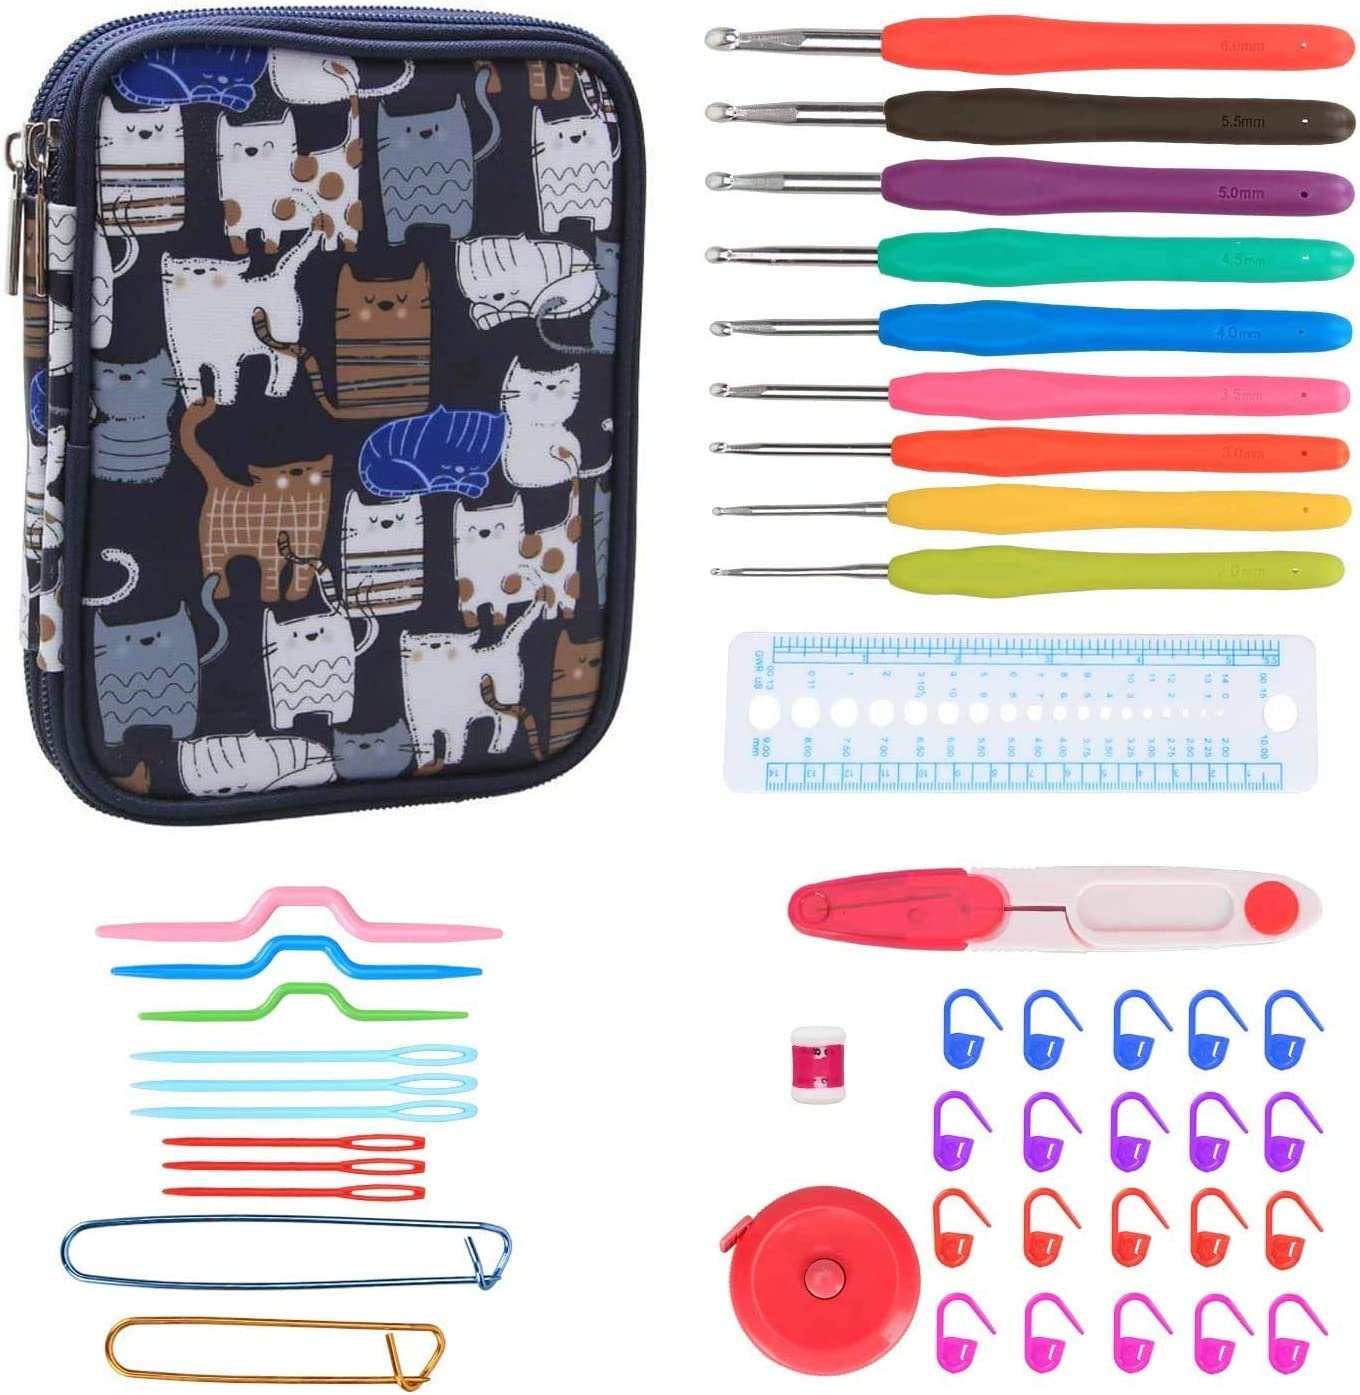 Teamoy Serie de Crochet Kits de Ganchillo Estuche para Crochet Organizador de Agujas Bolsa de Herramientas Juego del Ganchos (incluido accesorios),gato azul